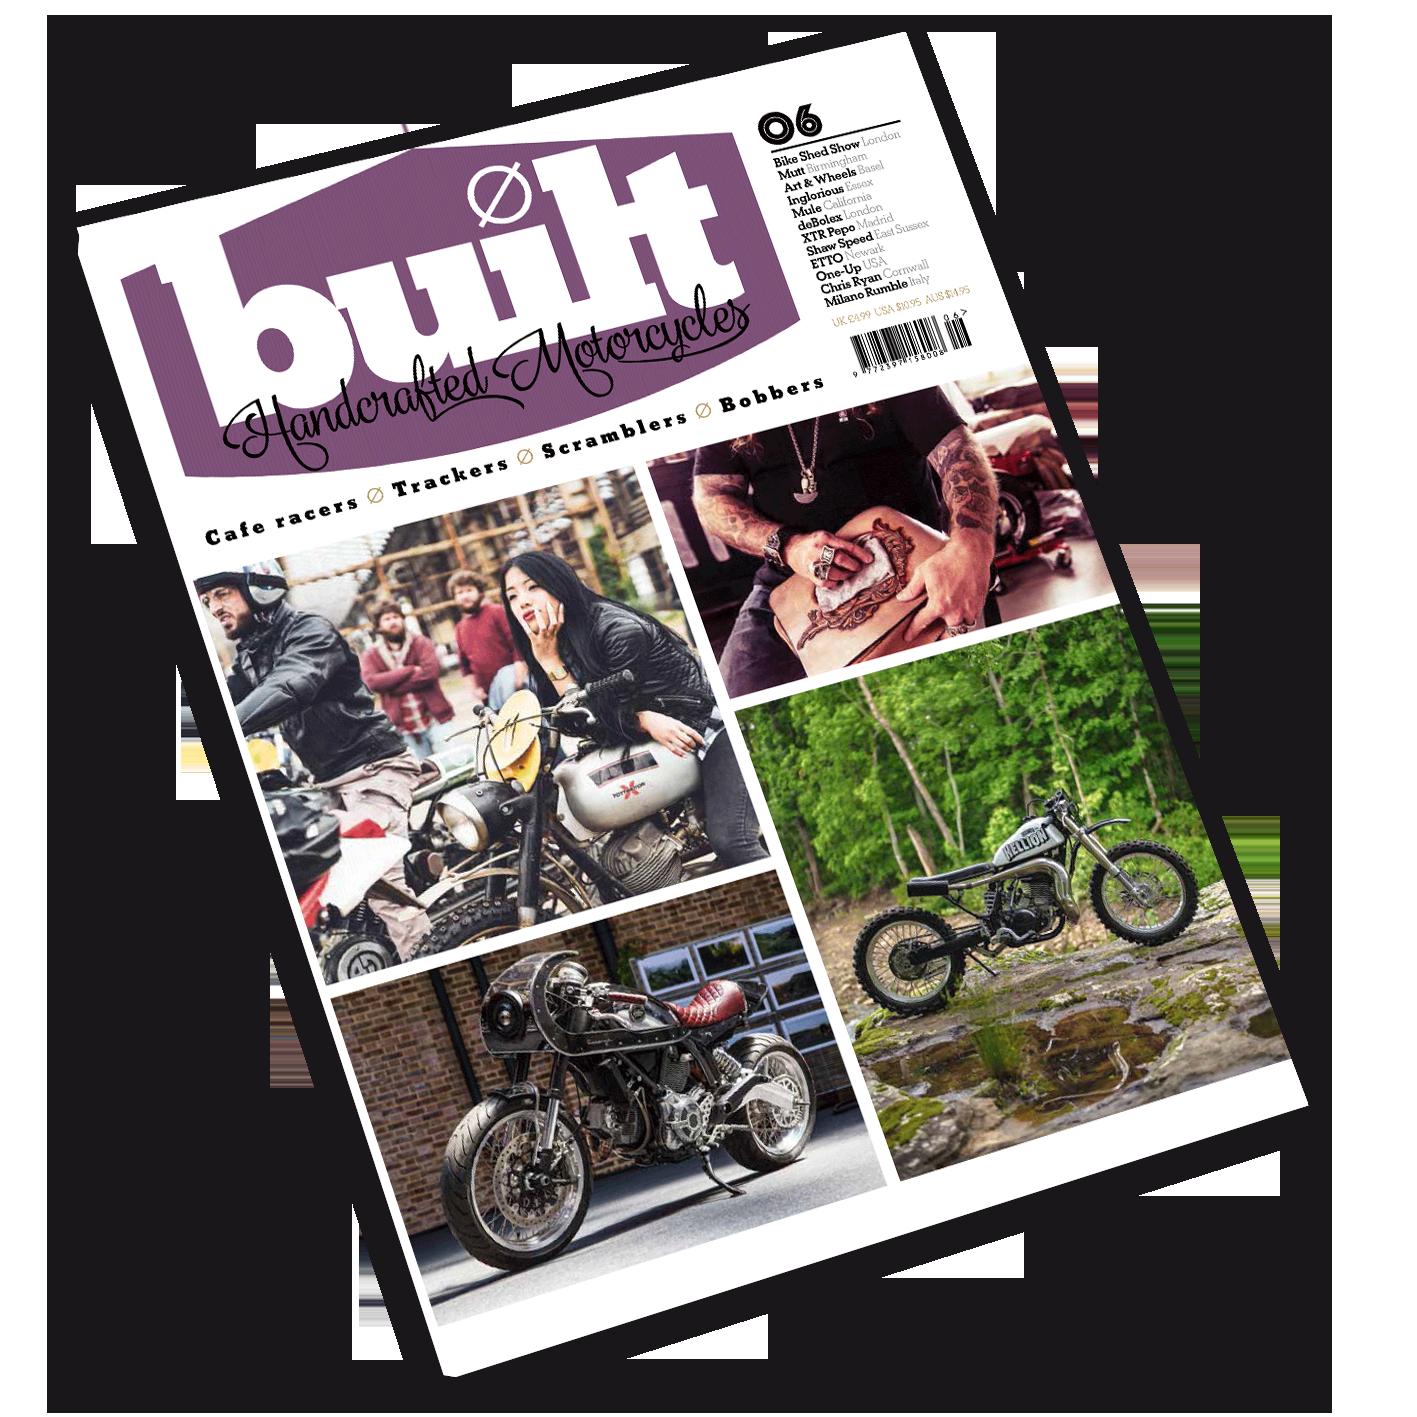 Built magazine issue 6